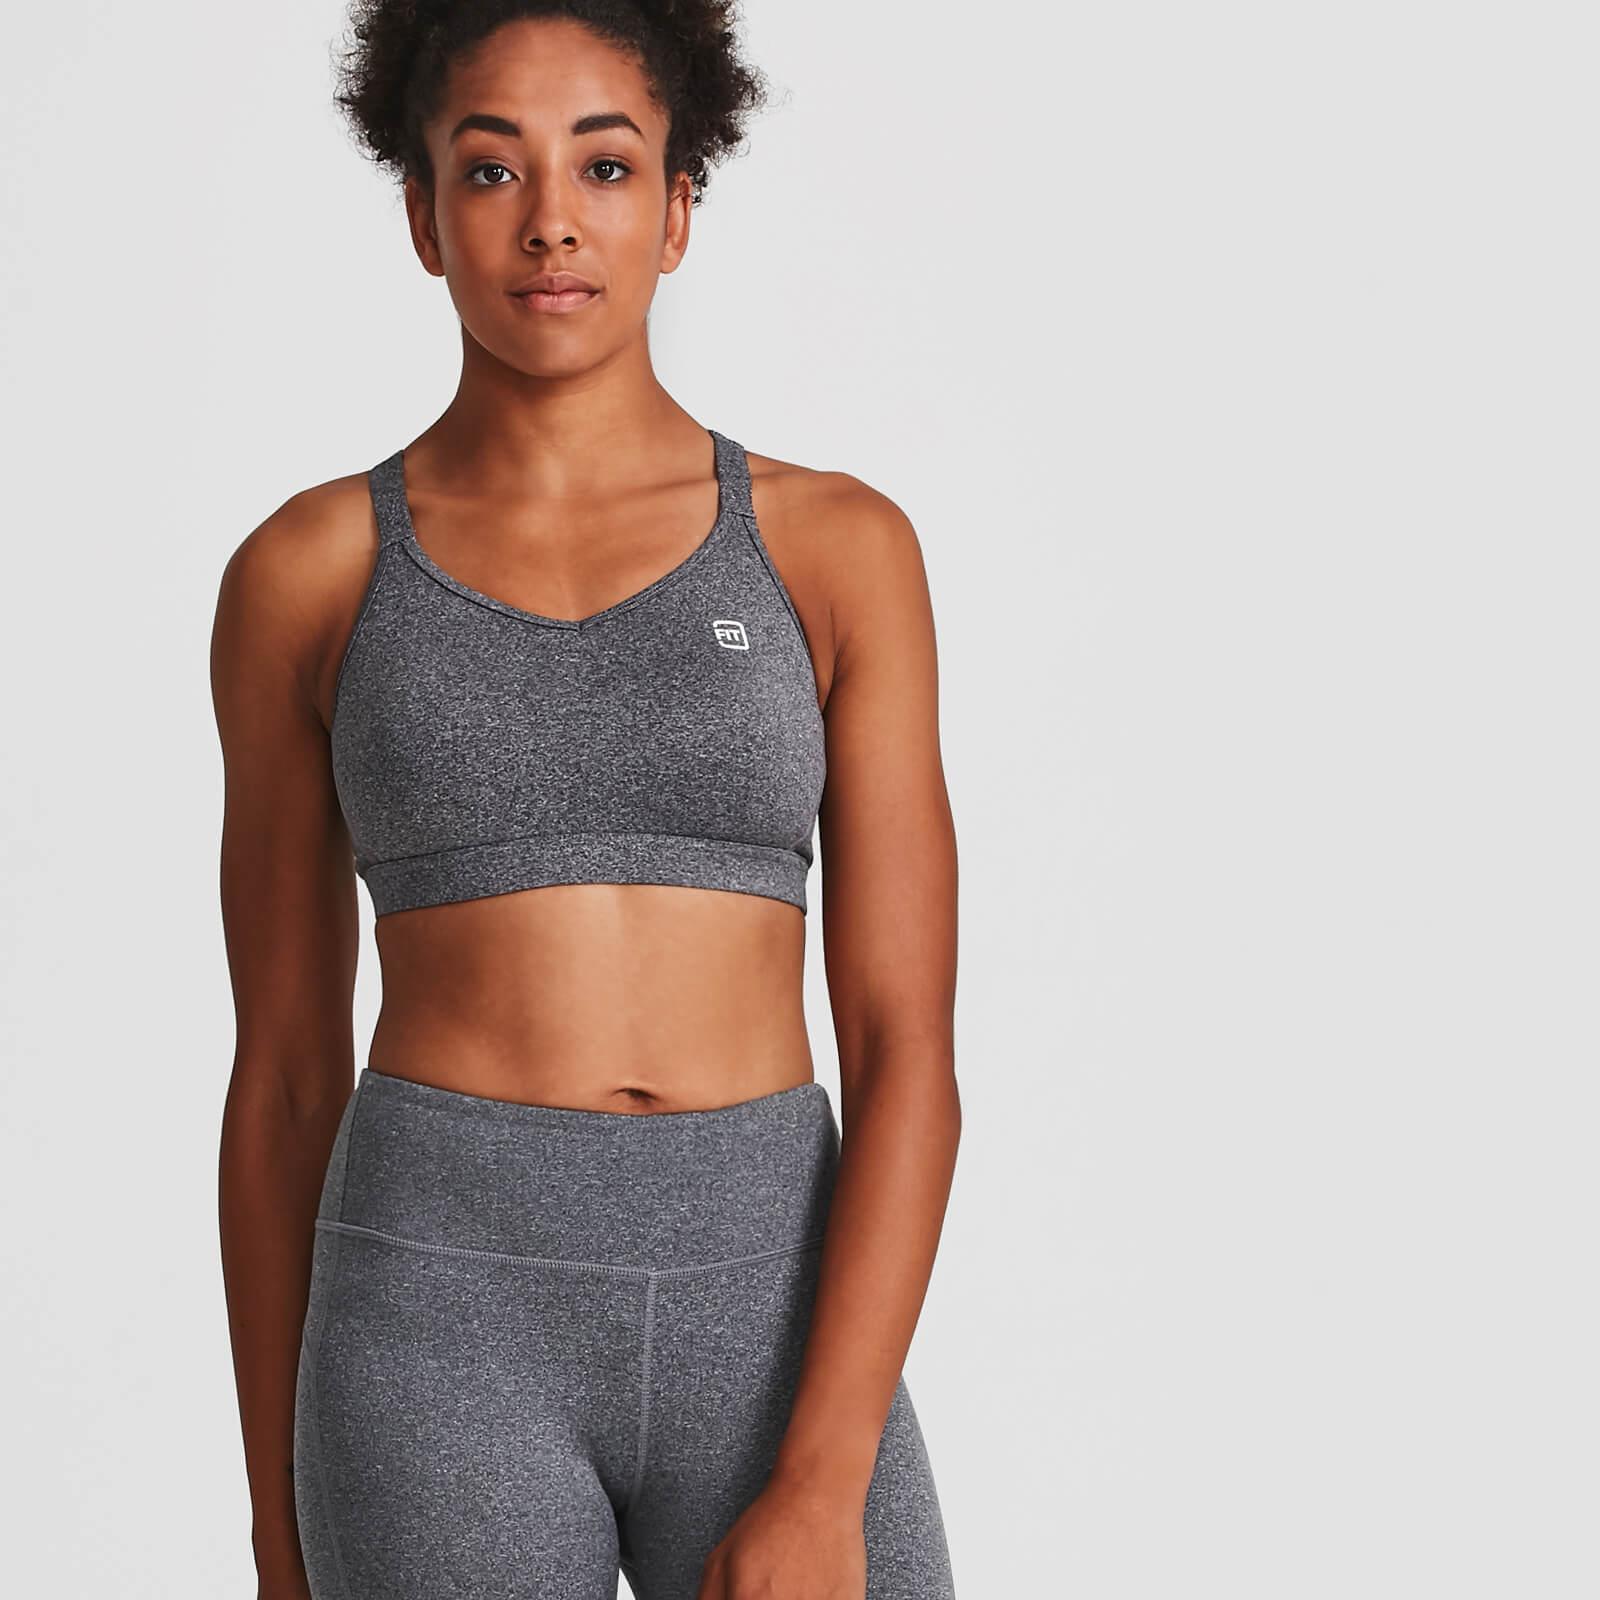 IdealFit Core Sports Bra - Grey - M - Grey